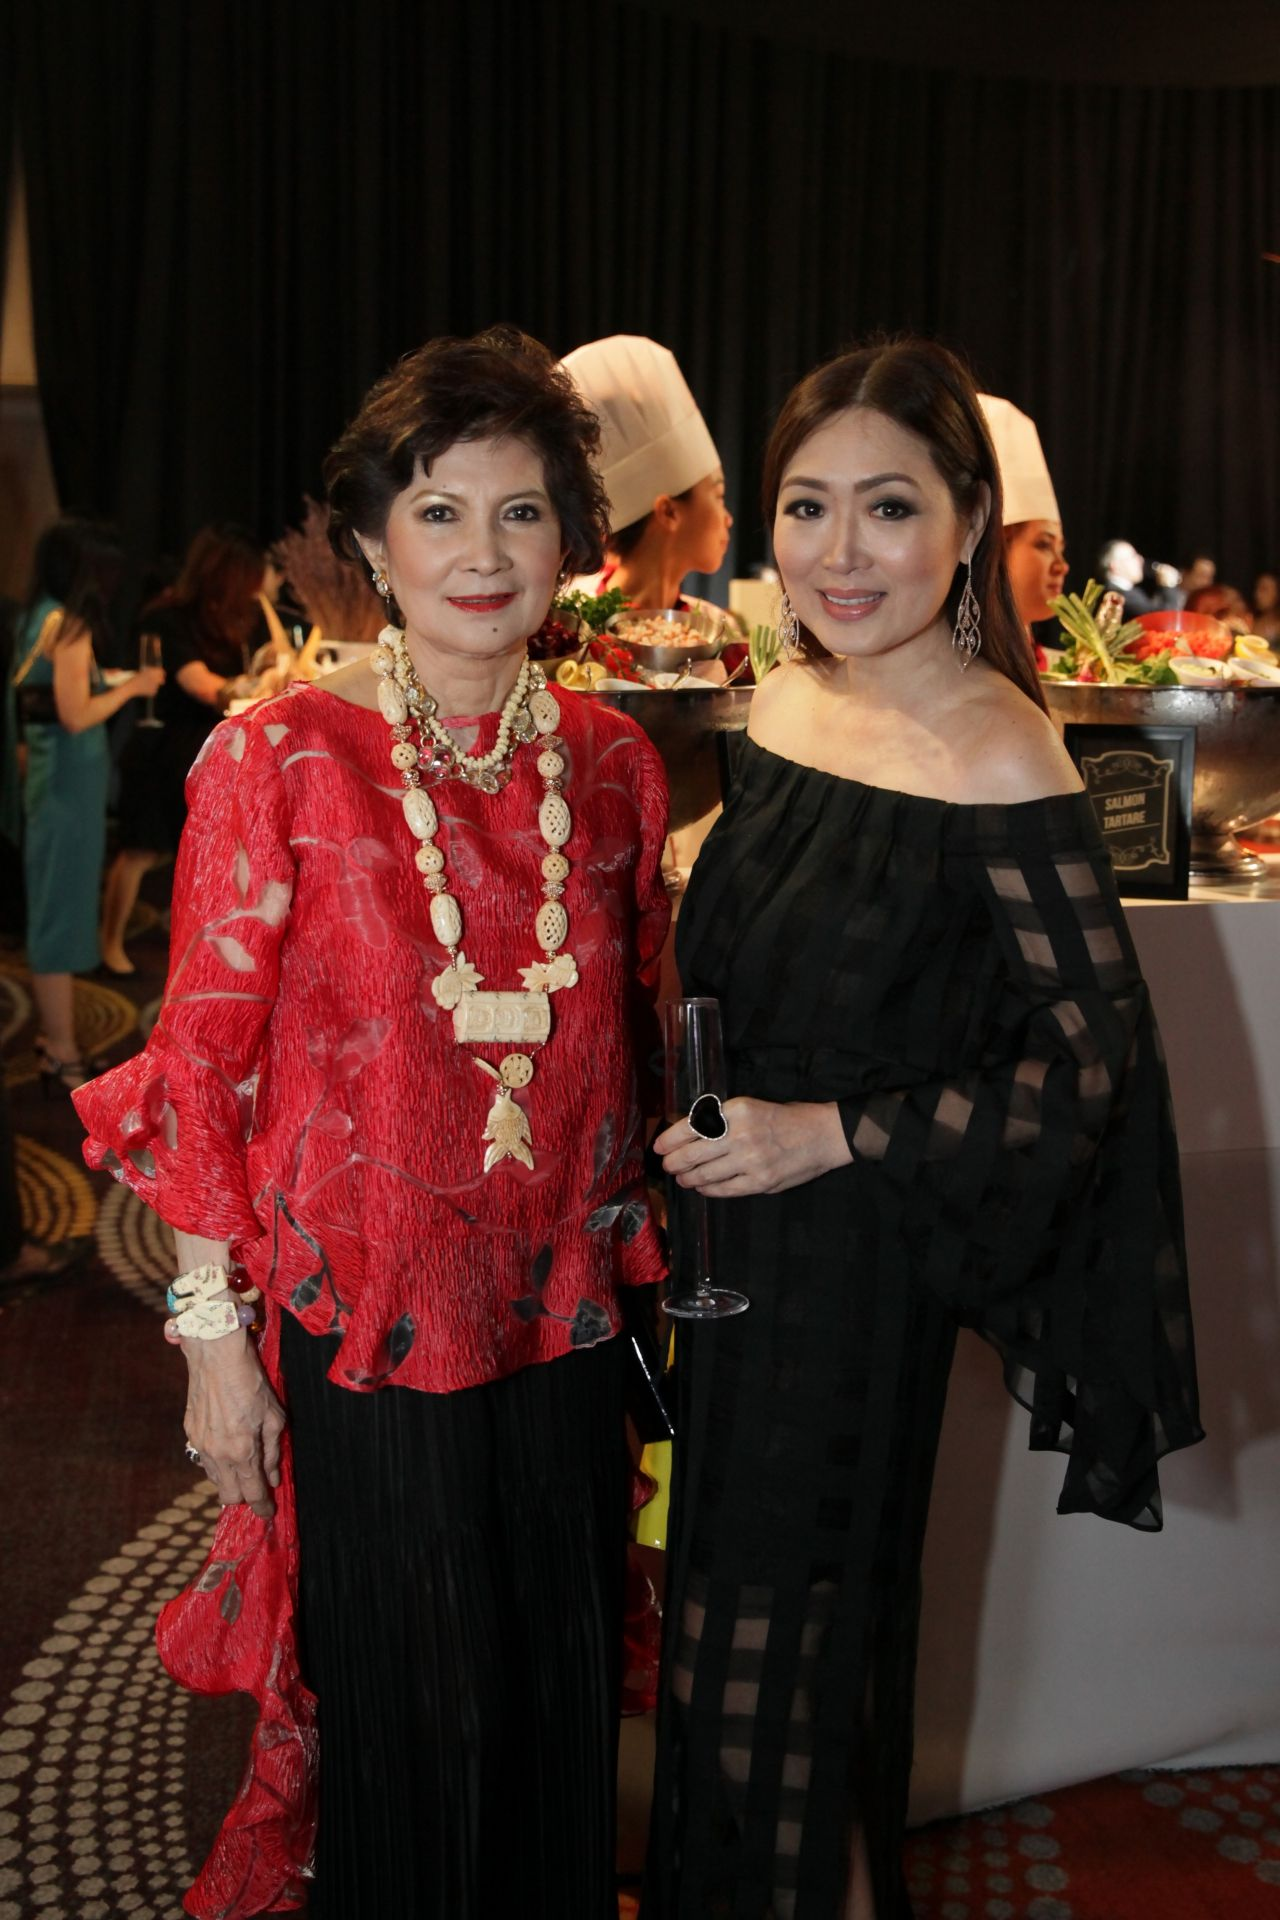 Criselda Lontok and Linda Ley